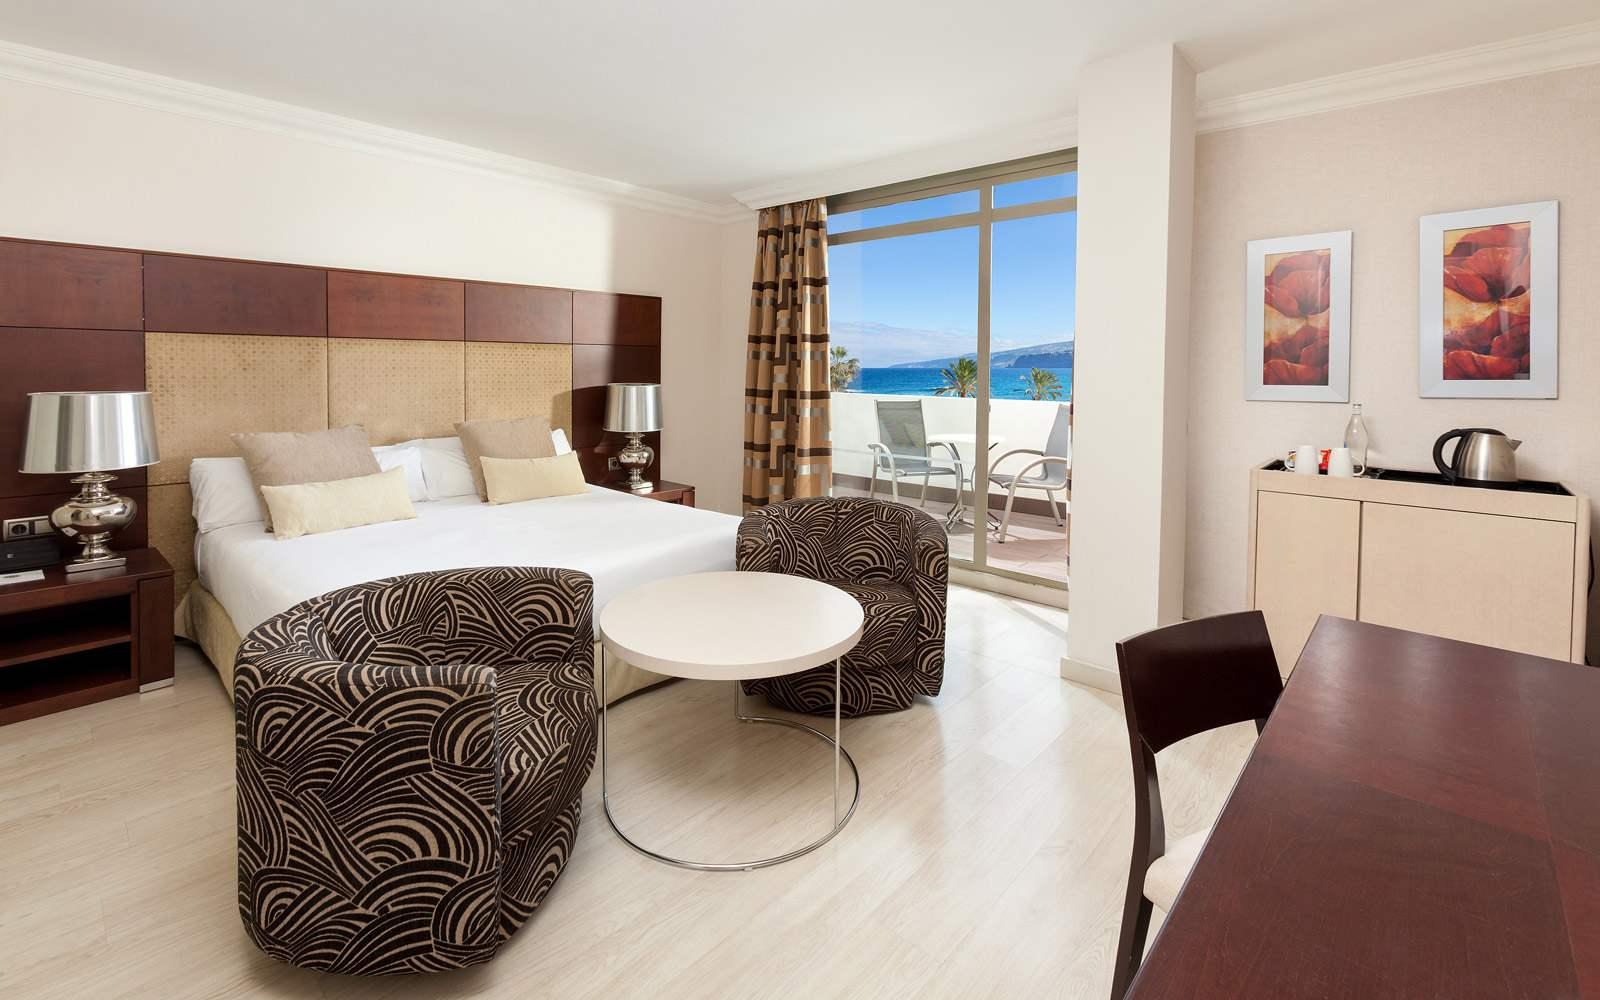 Sol Costa Atlantis Xtra Room